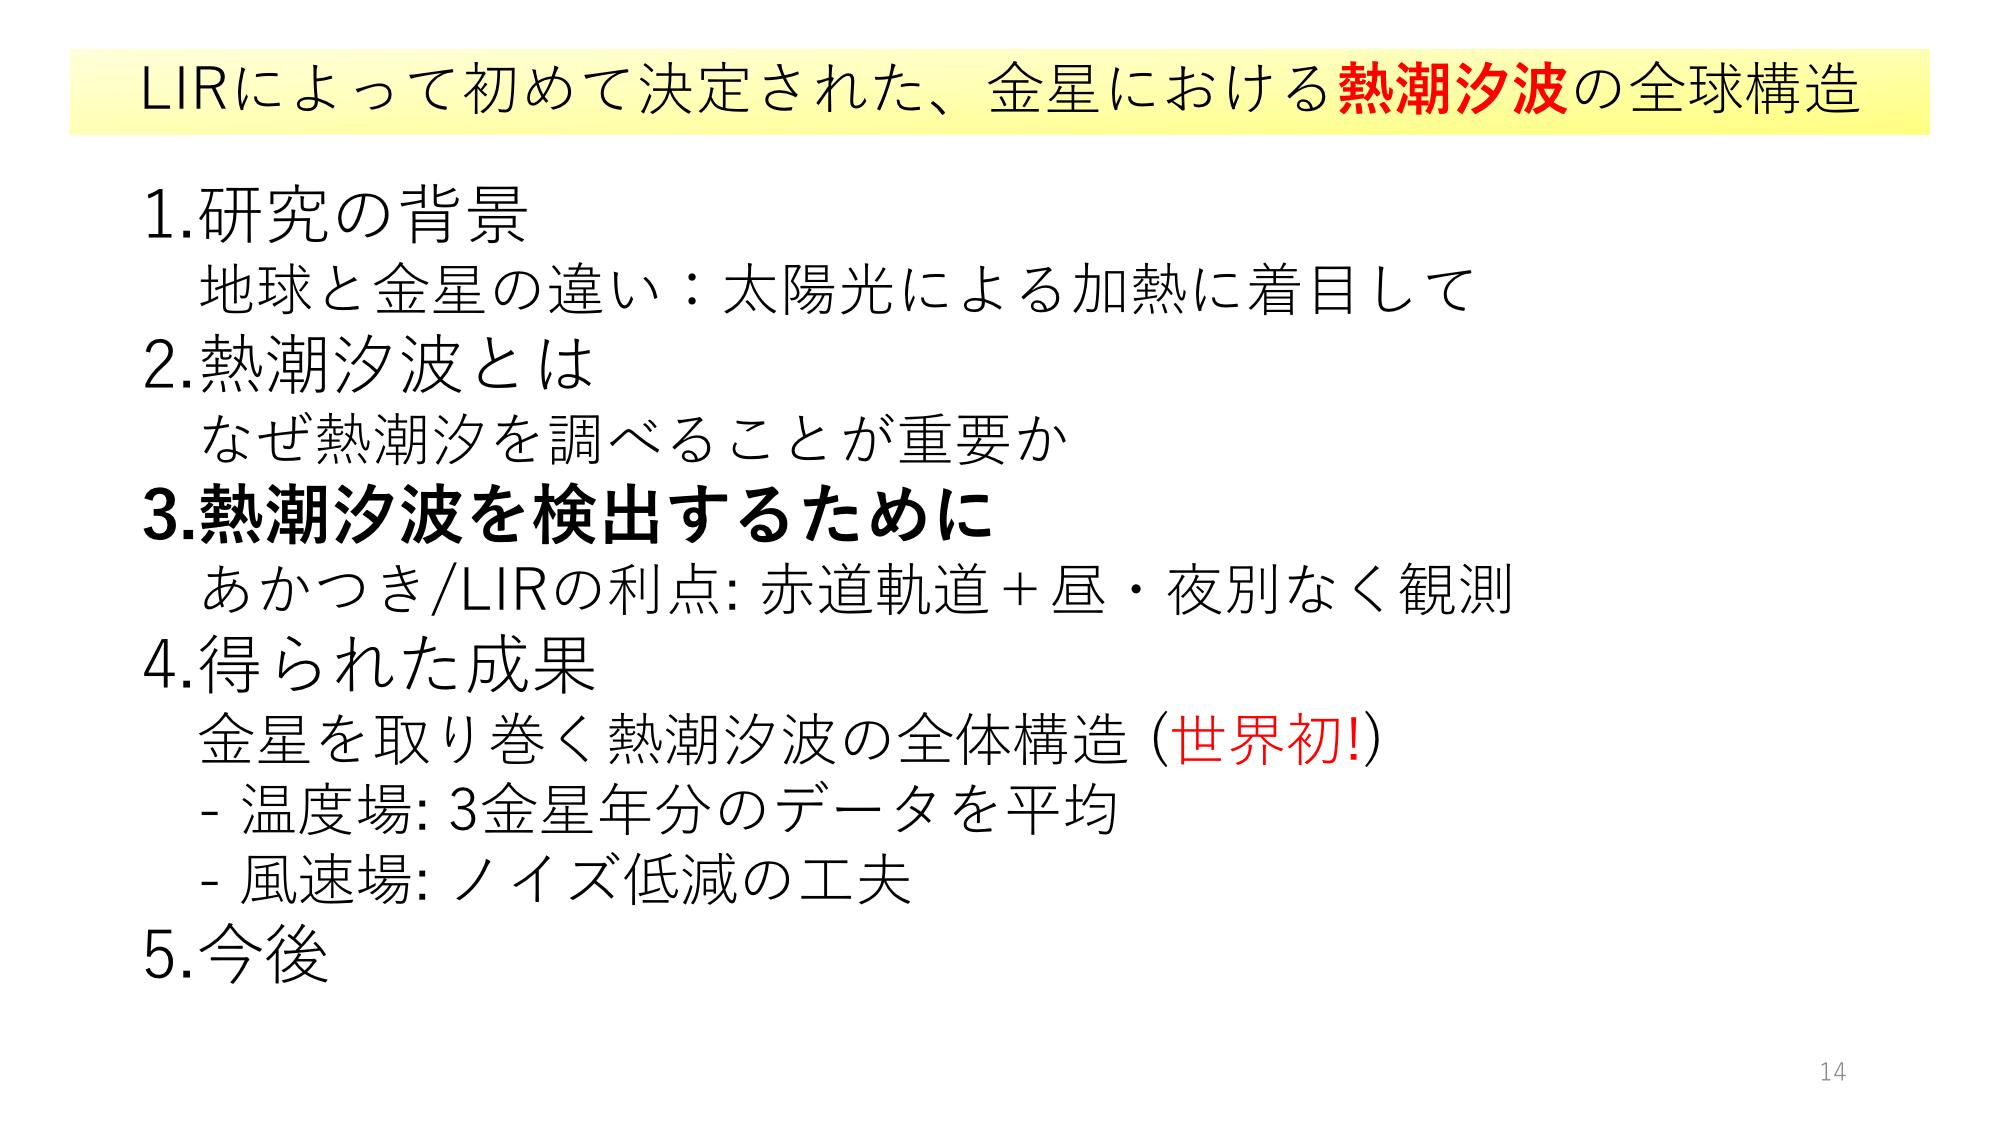 f:id:Imamura:20191119205457p:plain